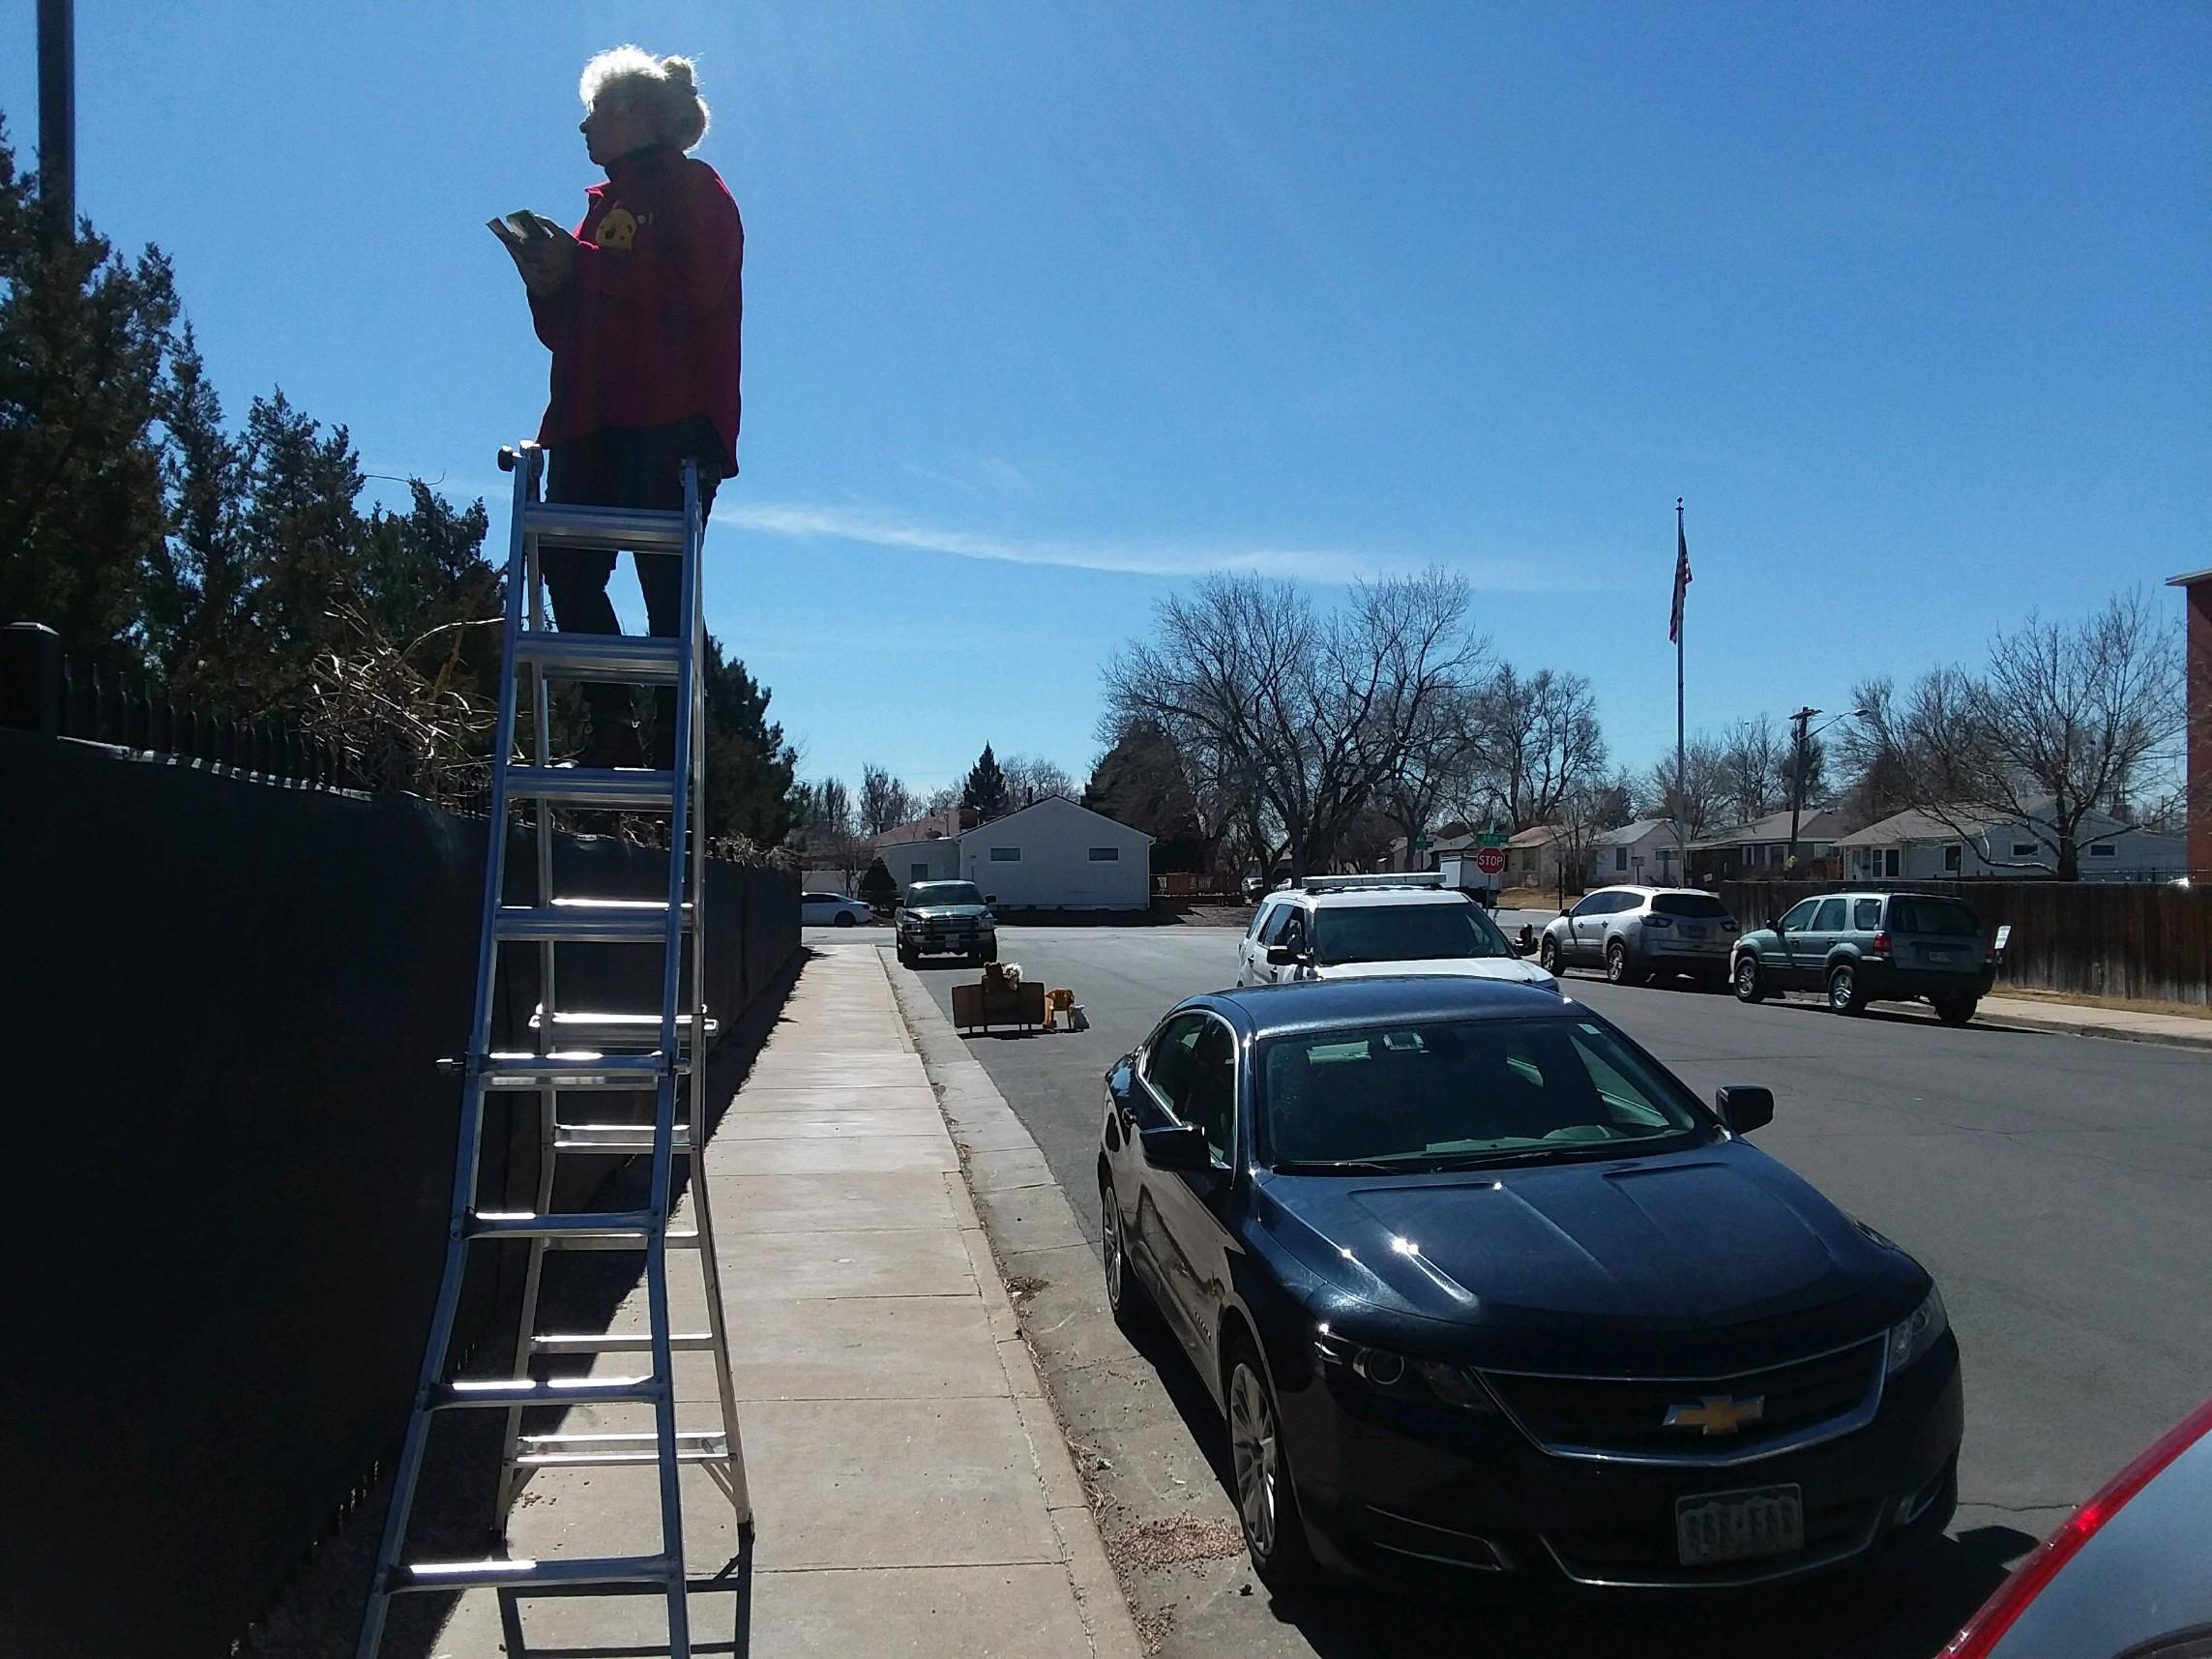 The day Denver police charge abolitionist Ken Scott, Jo Scott's husband, with ladder-blocking Planned Parenthood's sidewalk